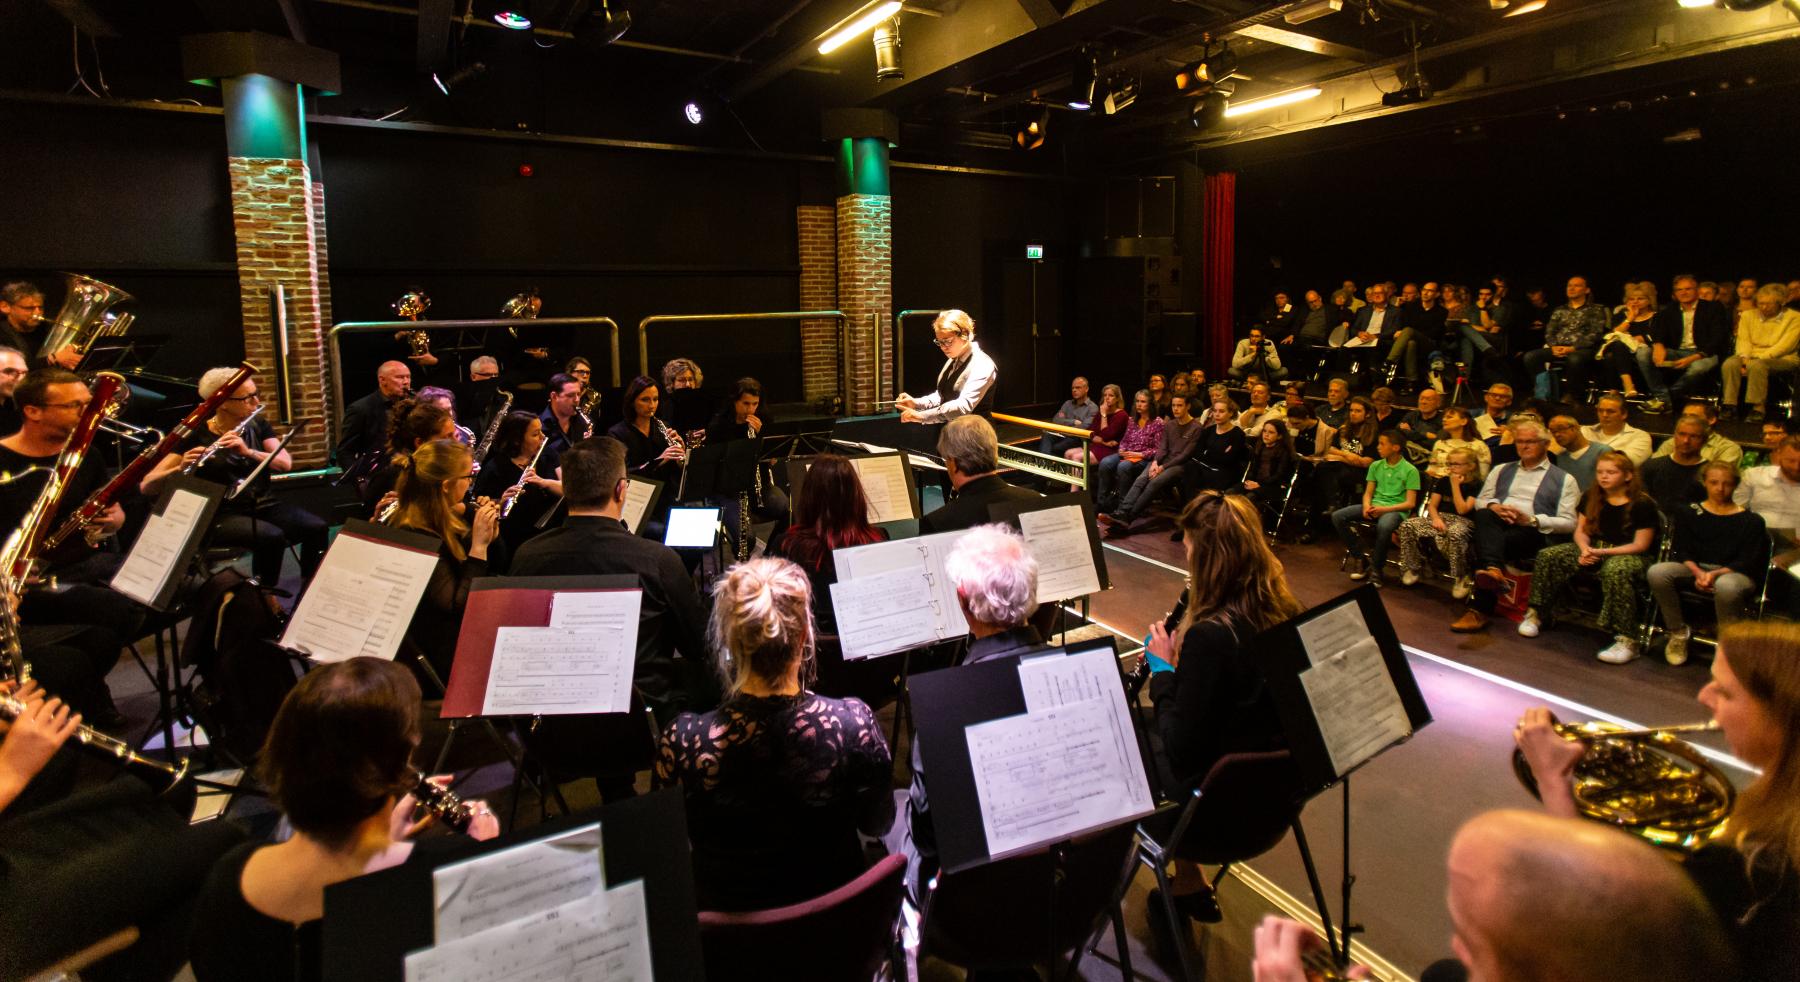 Graduation_Concert_Loes_Reiling-125